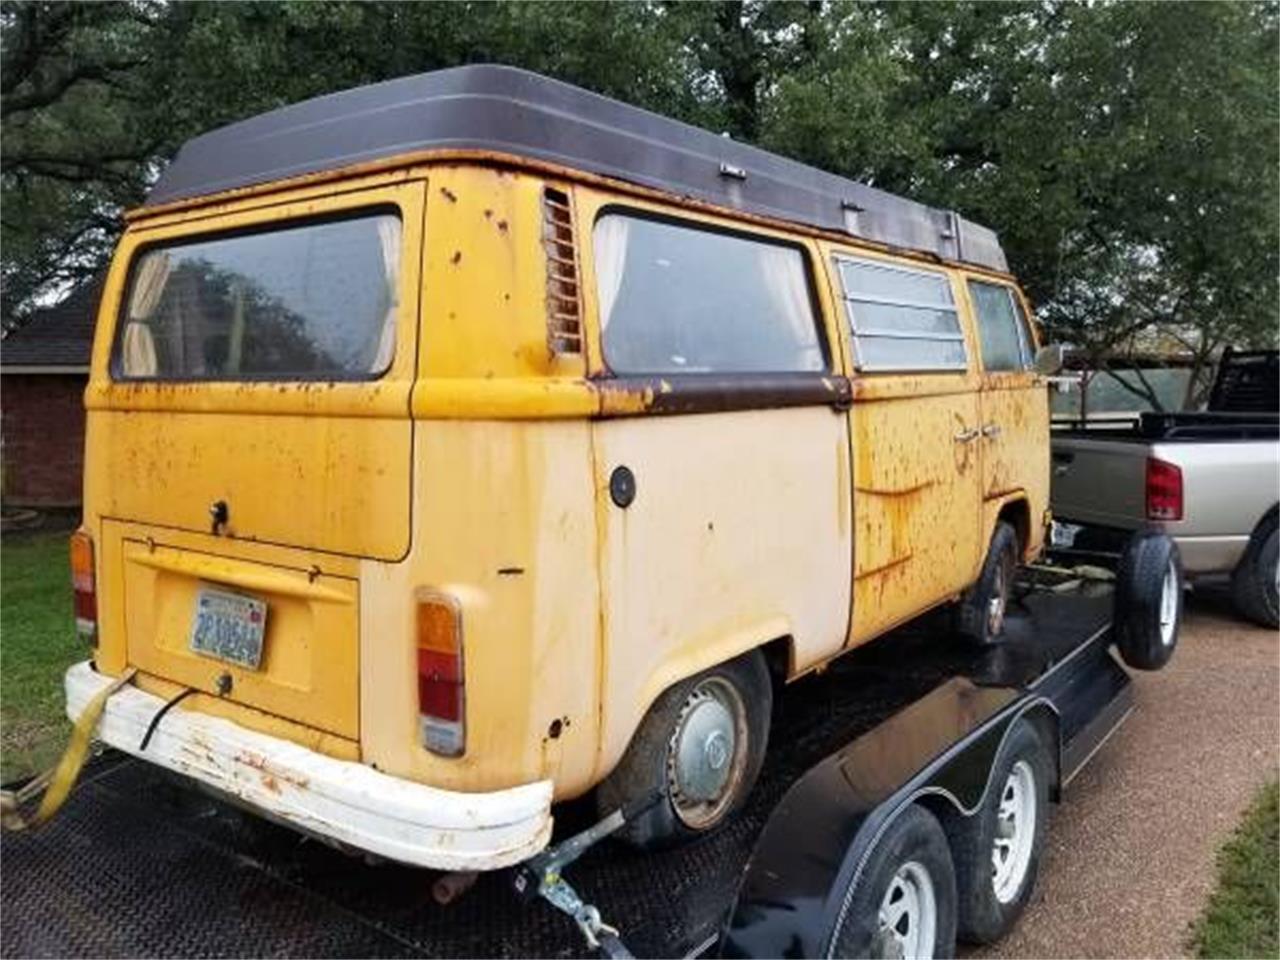 1977 Volkswagen Bus For Sale Classiccars Com Cc 1166495